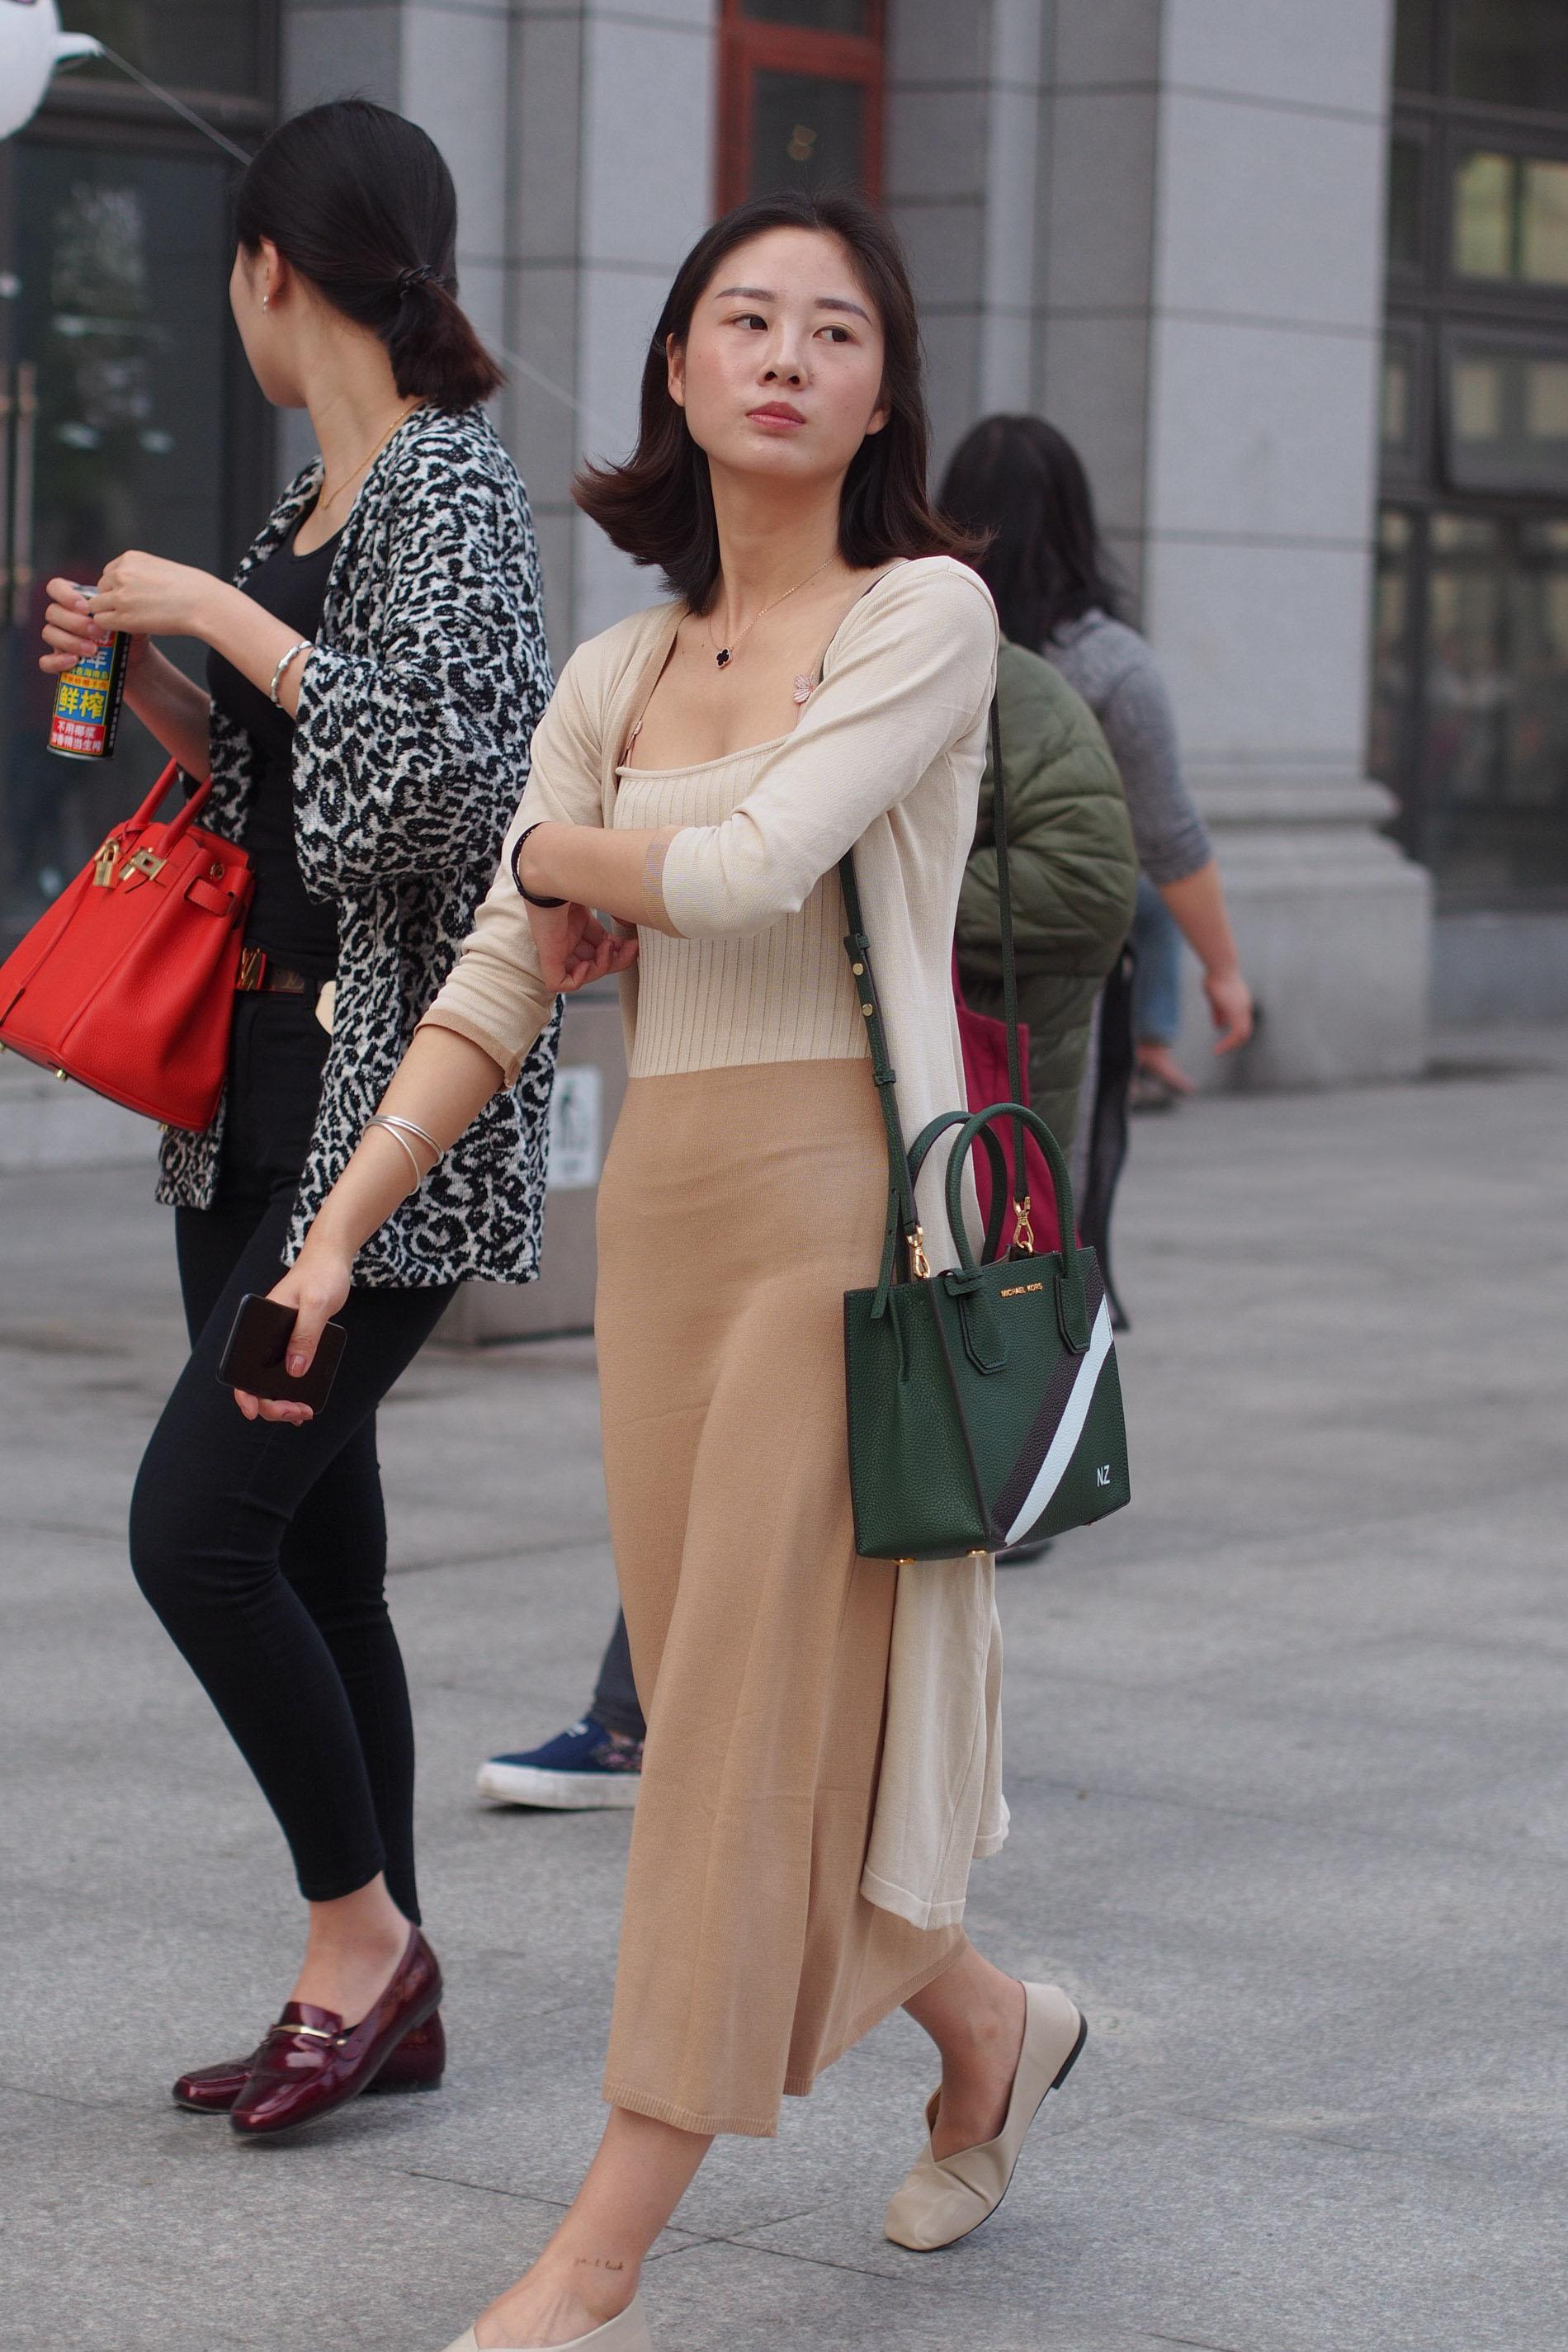 com 上海ktv美女街拍-1上海美女街拍 街拍美女网 图片 2304 x 3456